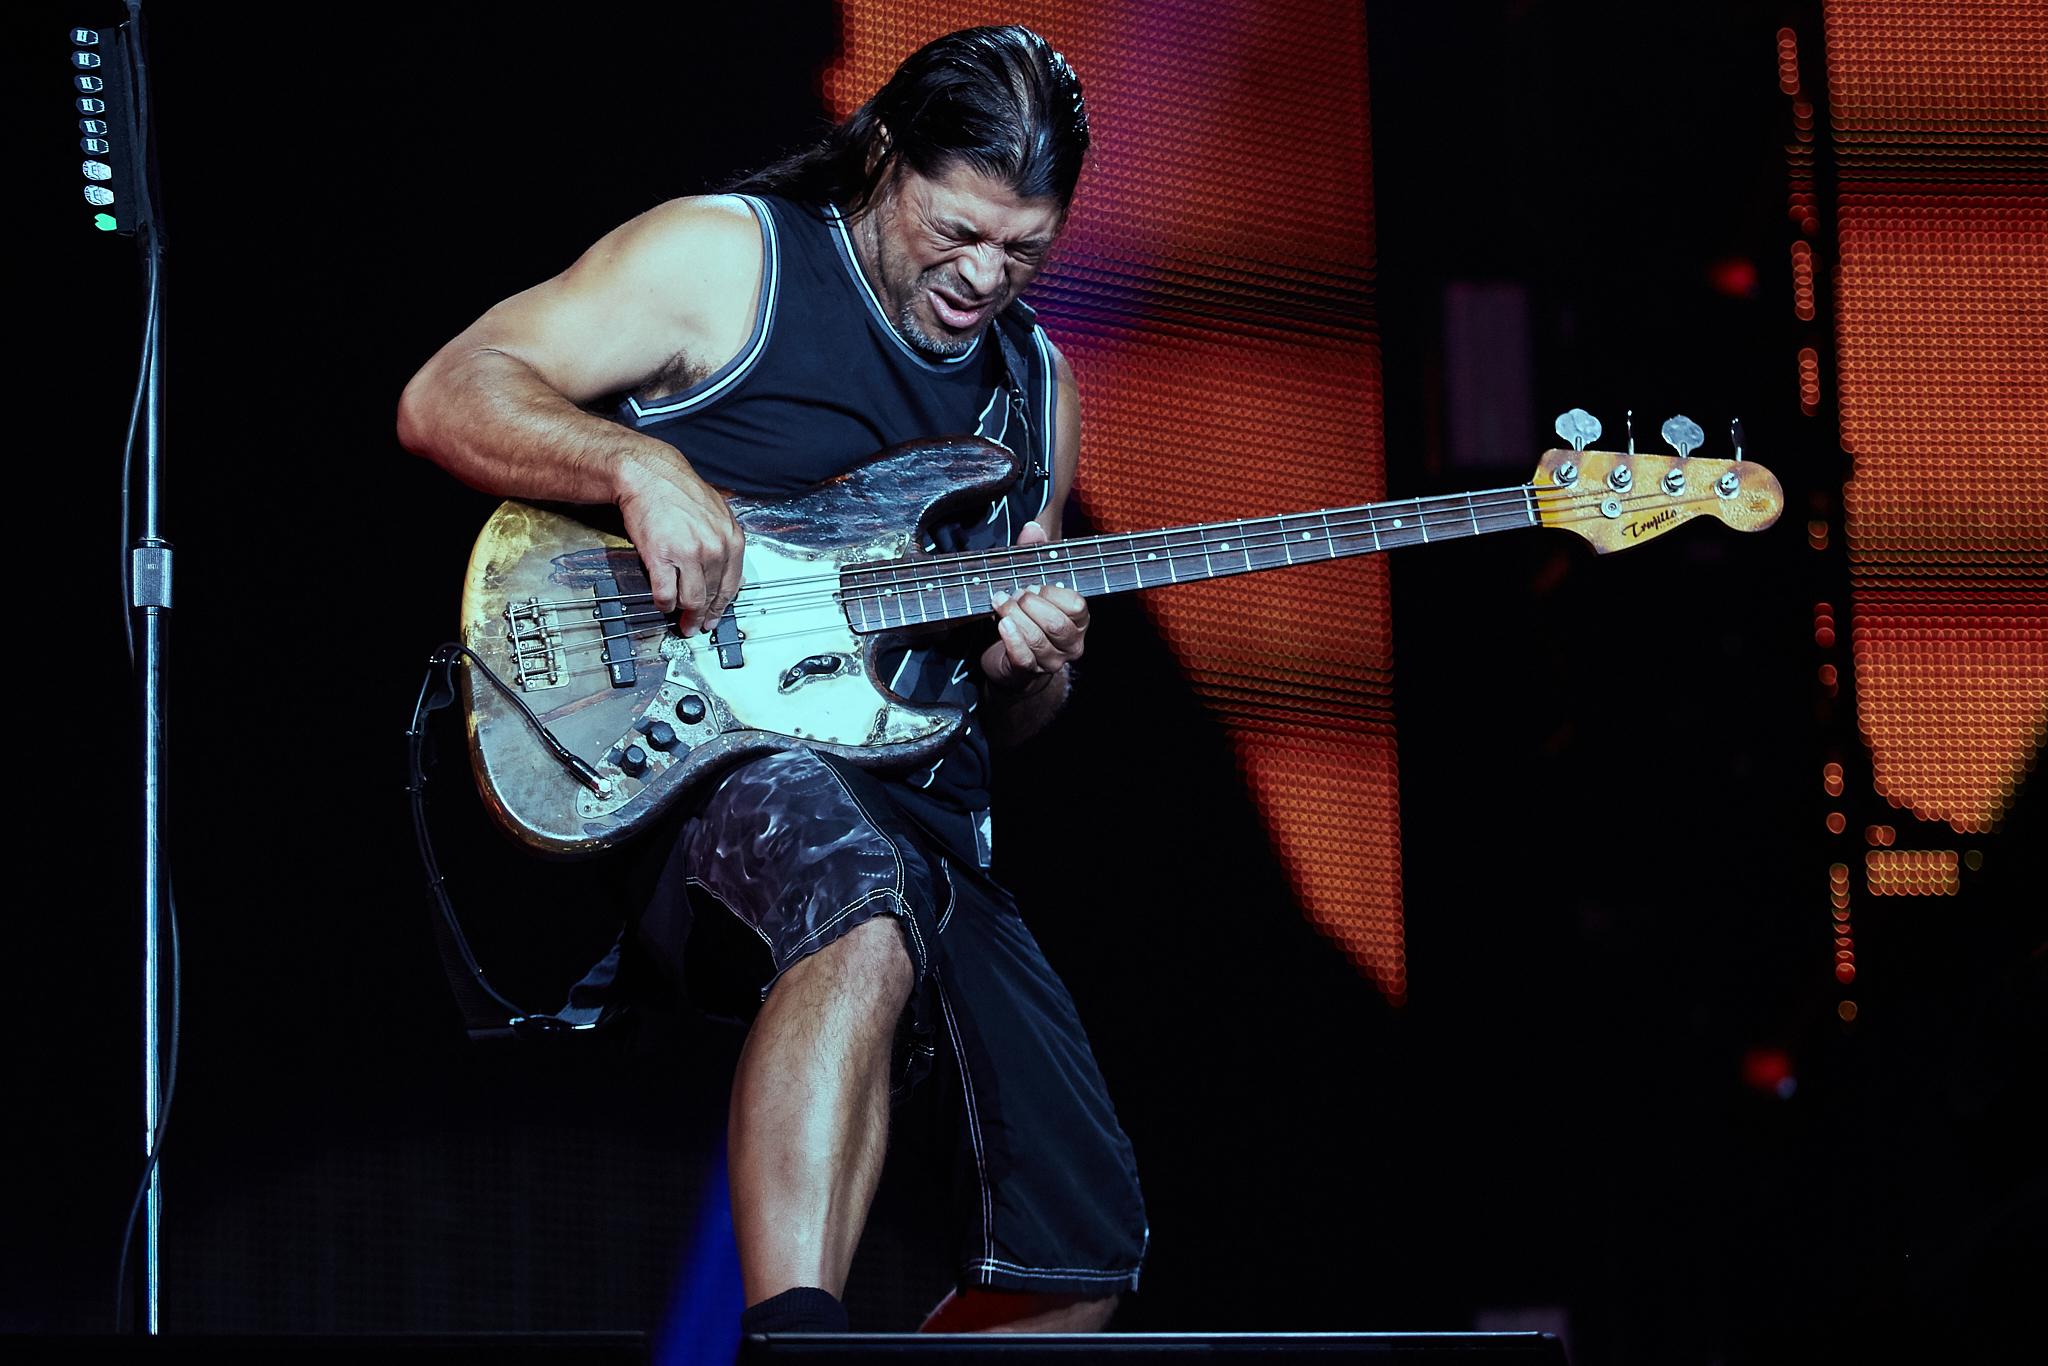 Metallica_at_US_Bank_Stadium_Minneapolis_First_Rock_Show_08-20_2016_Photo_By_Joe_Lemke_017.jpg